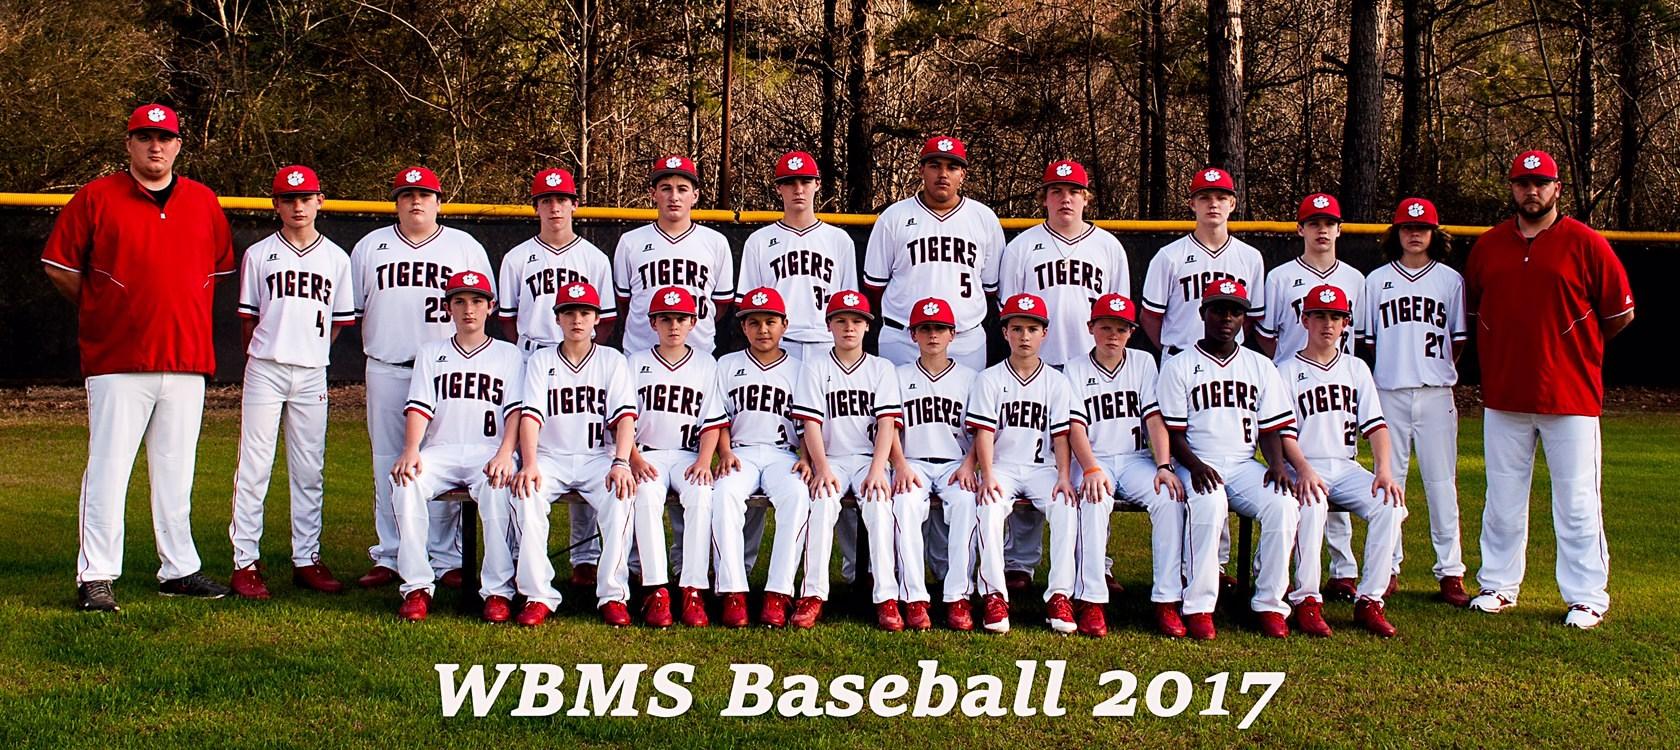 WBMS 2017 Baseball Team